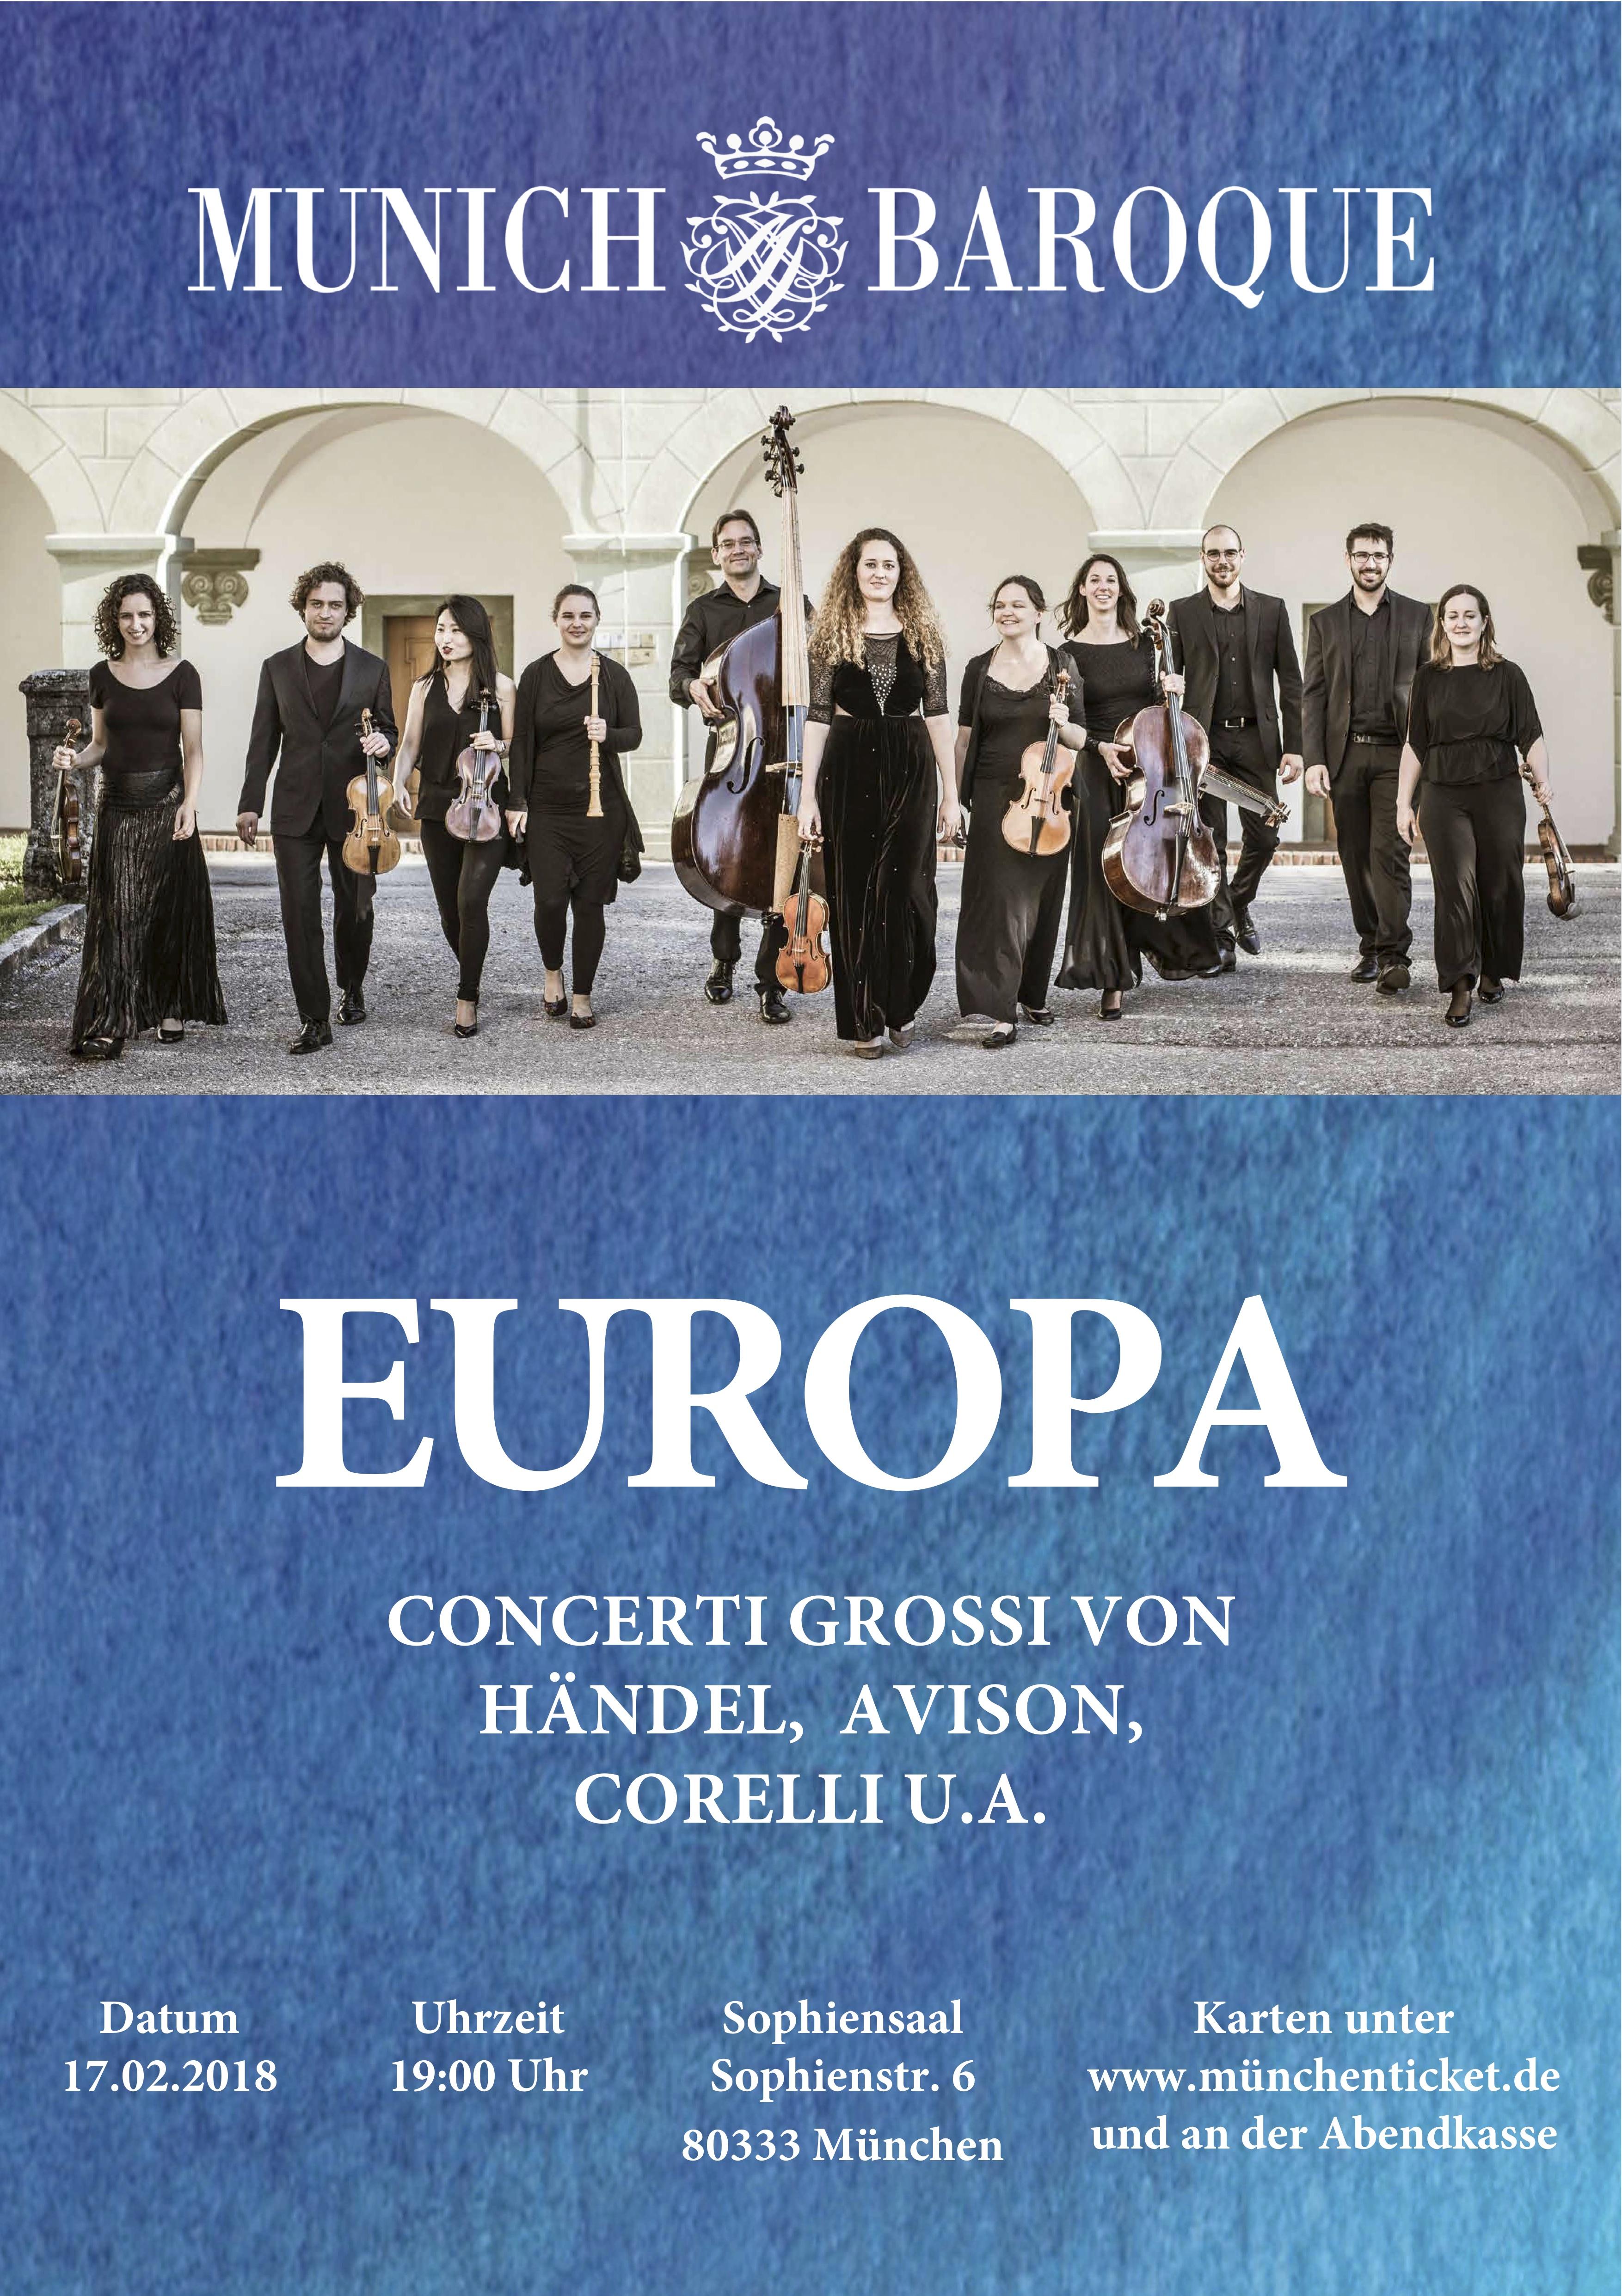 Europa – Concerti grossi von Händel, Avison, Corelli u.A.